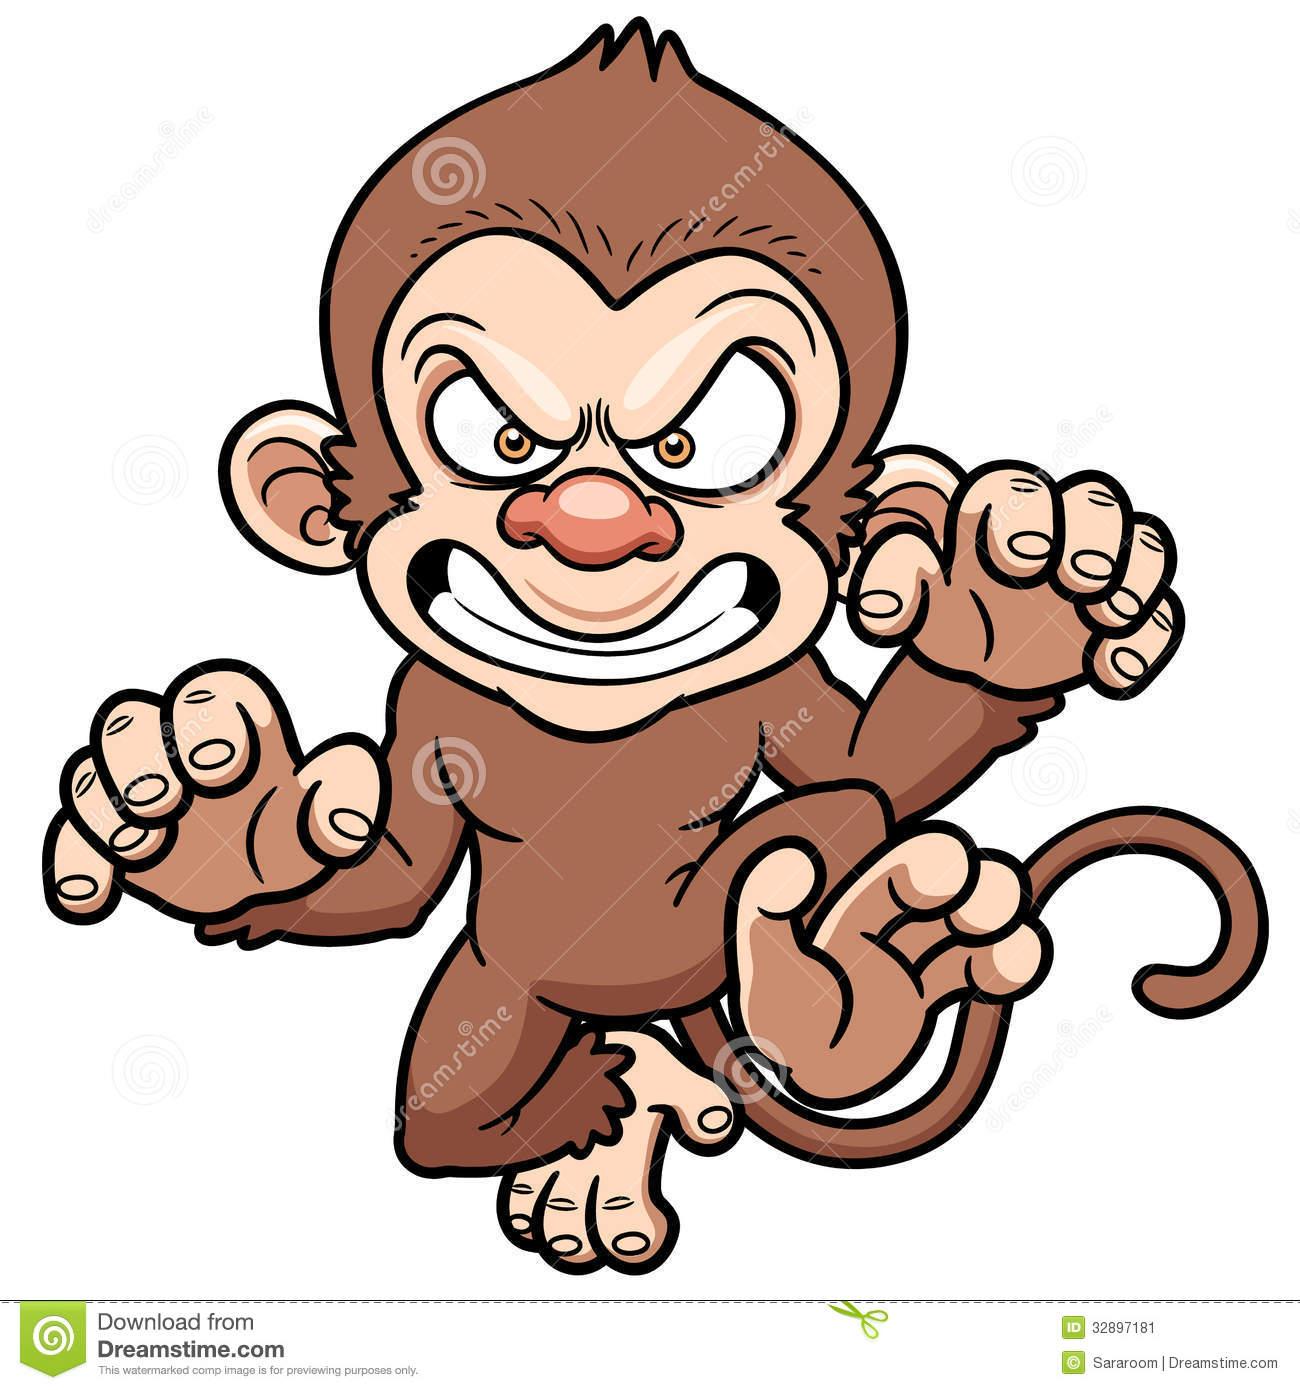 monkey cartoon wallpaper - photo #26